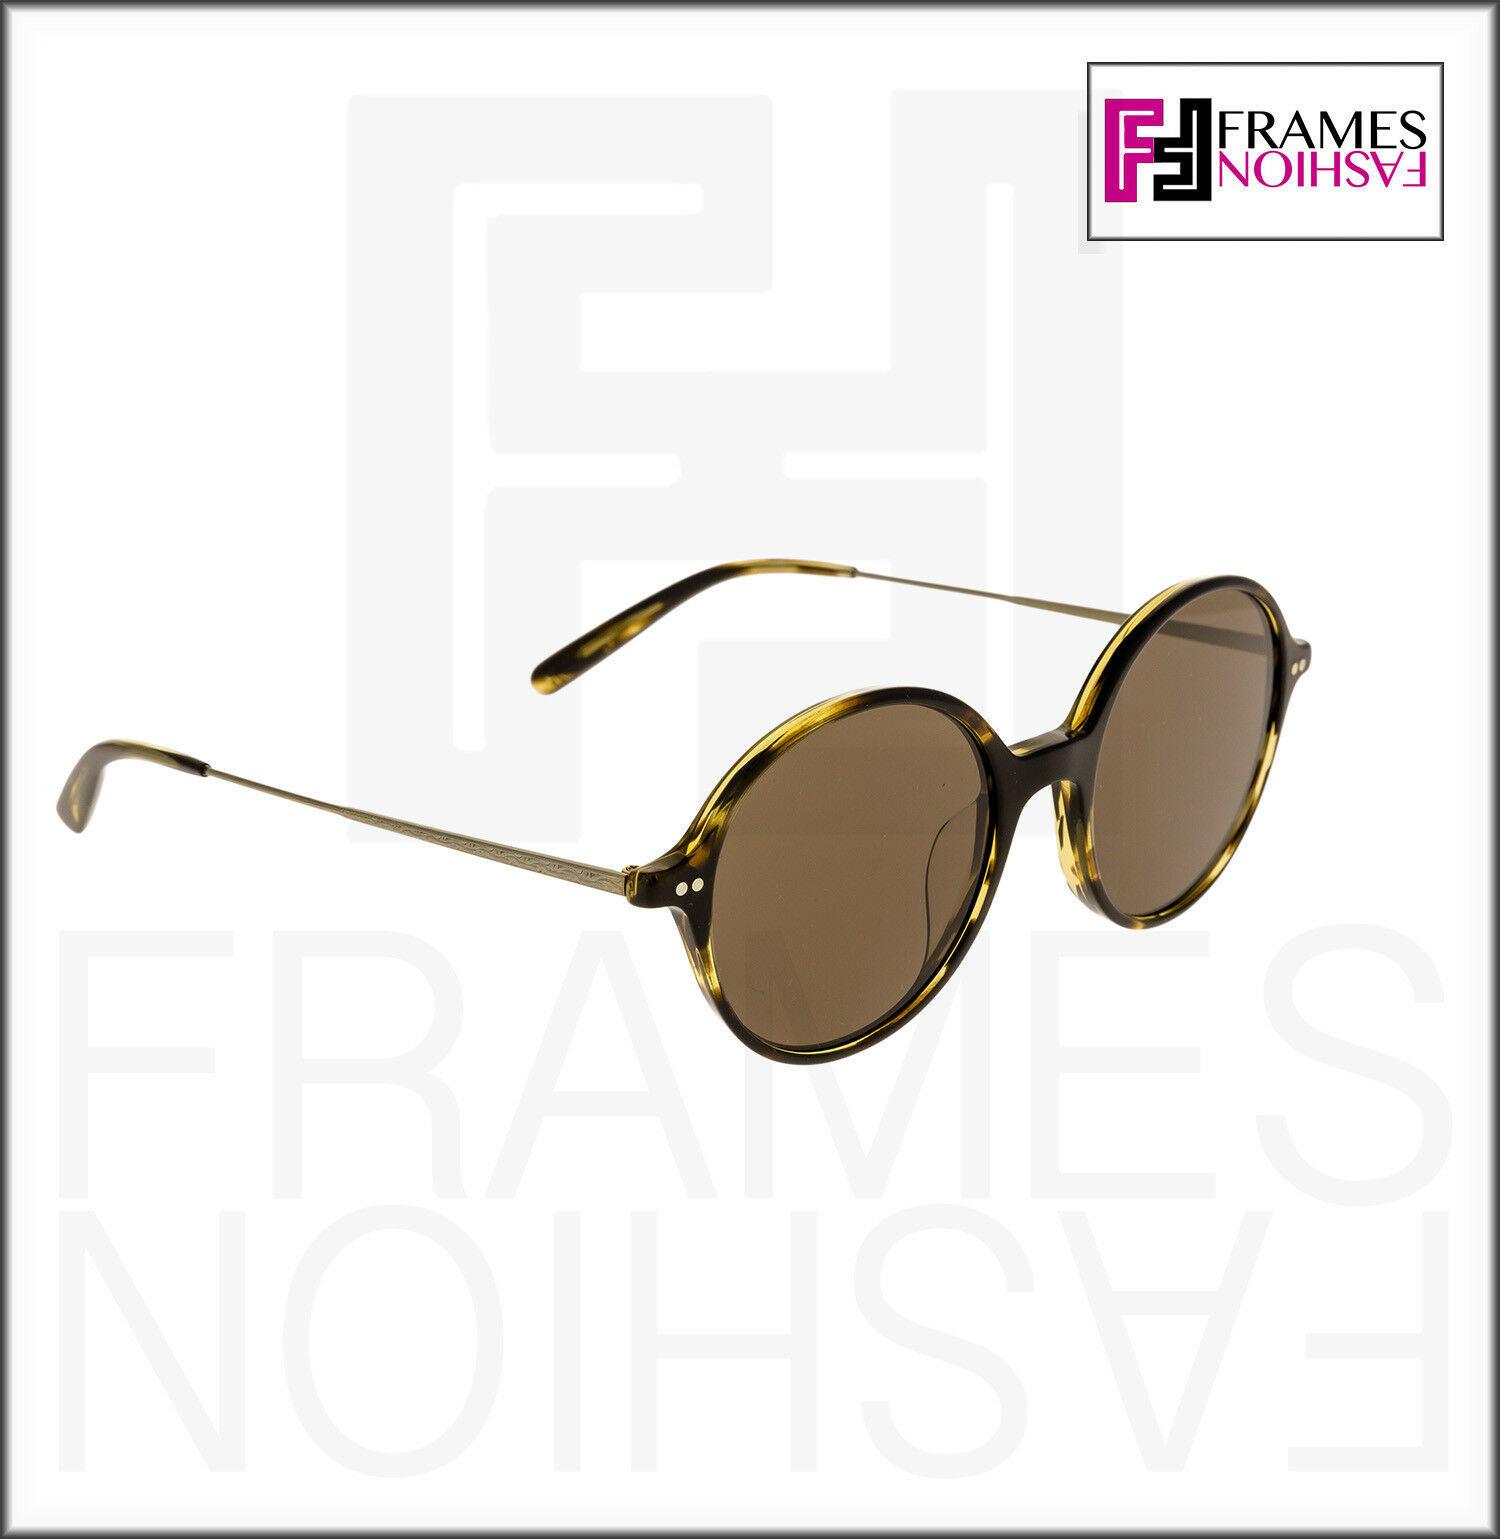 OLIVER PEOPLES CORBY OV5347SU Cocobolo Brown Gold Round Sunglasses 5347 Unisex image 5